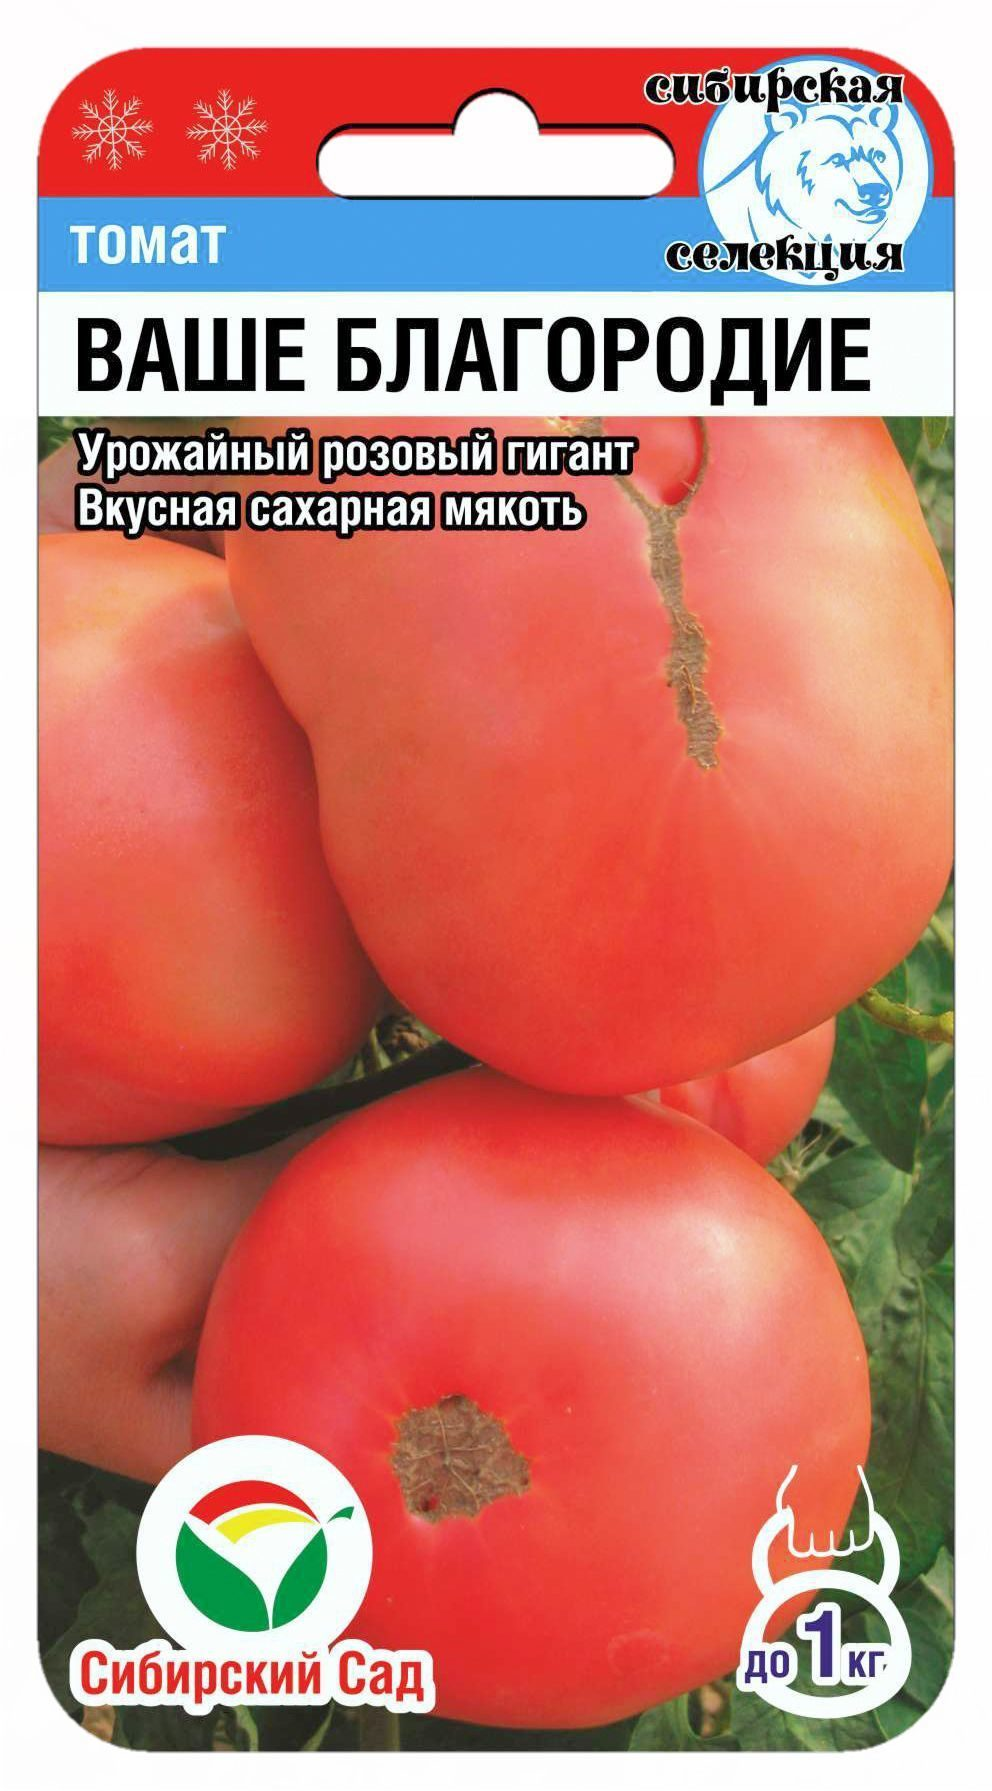 Томат ваше благородие — описание и характеристика сорта | zdavnews.ru